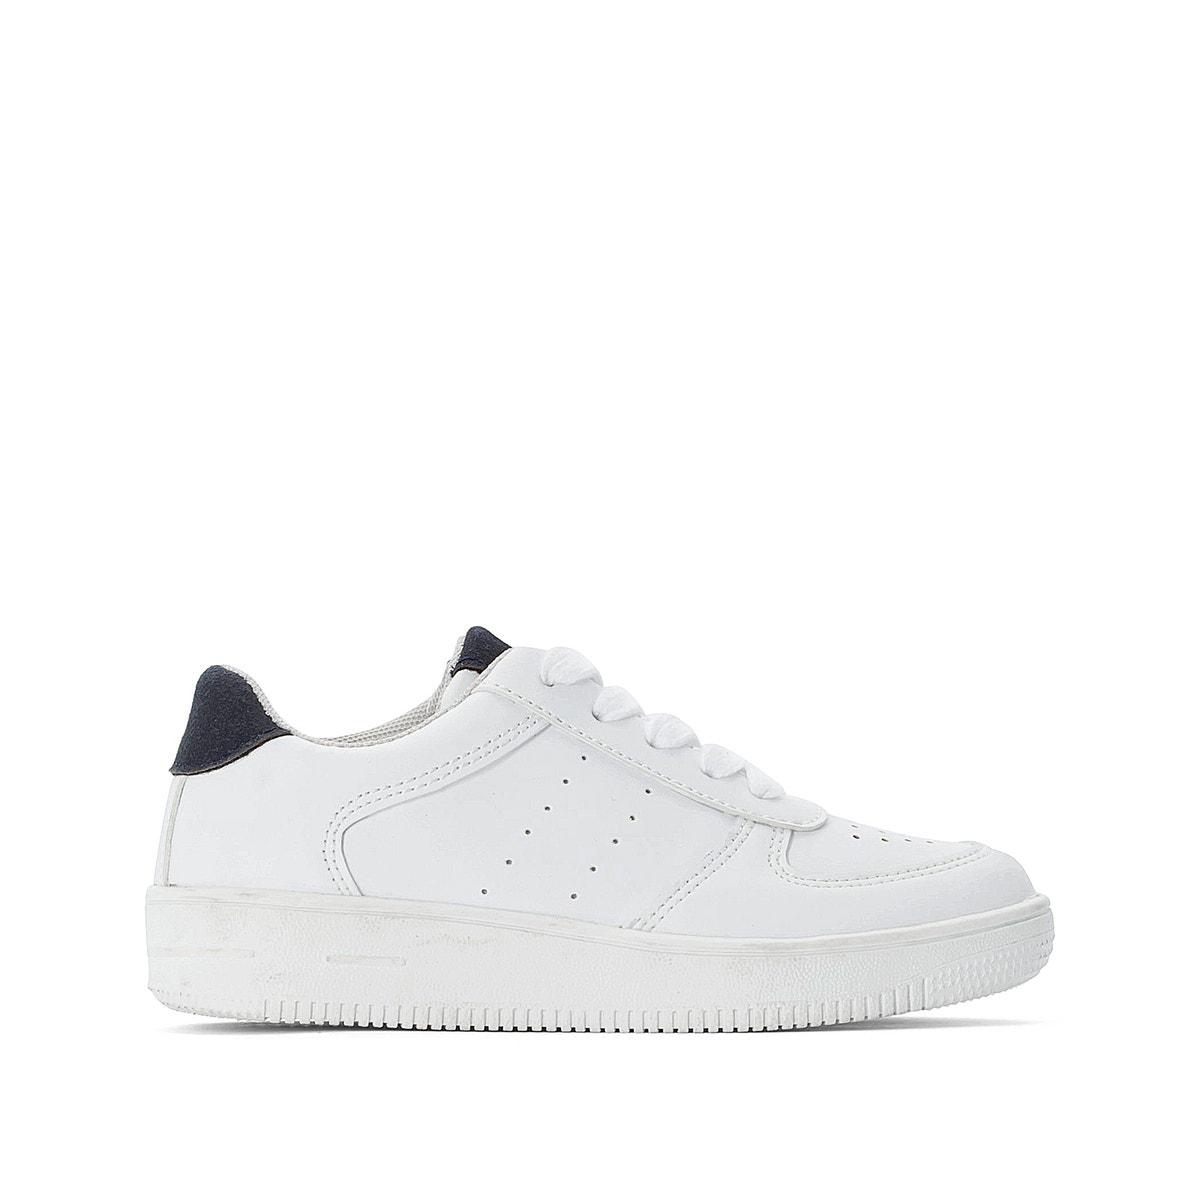 La Redoute Collections - Αθλητικά παπούτσια με κορδόνια, μεγέθη 26-39 350159756 - 10465